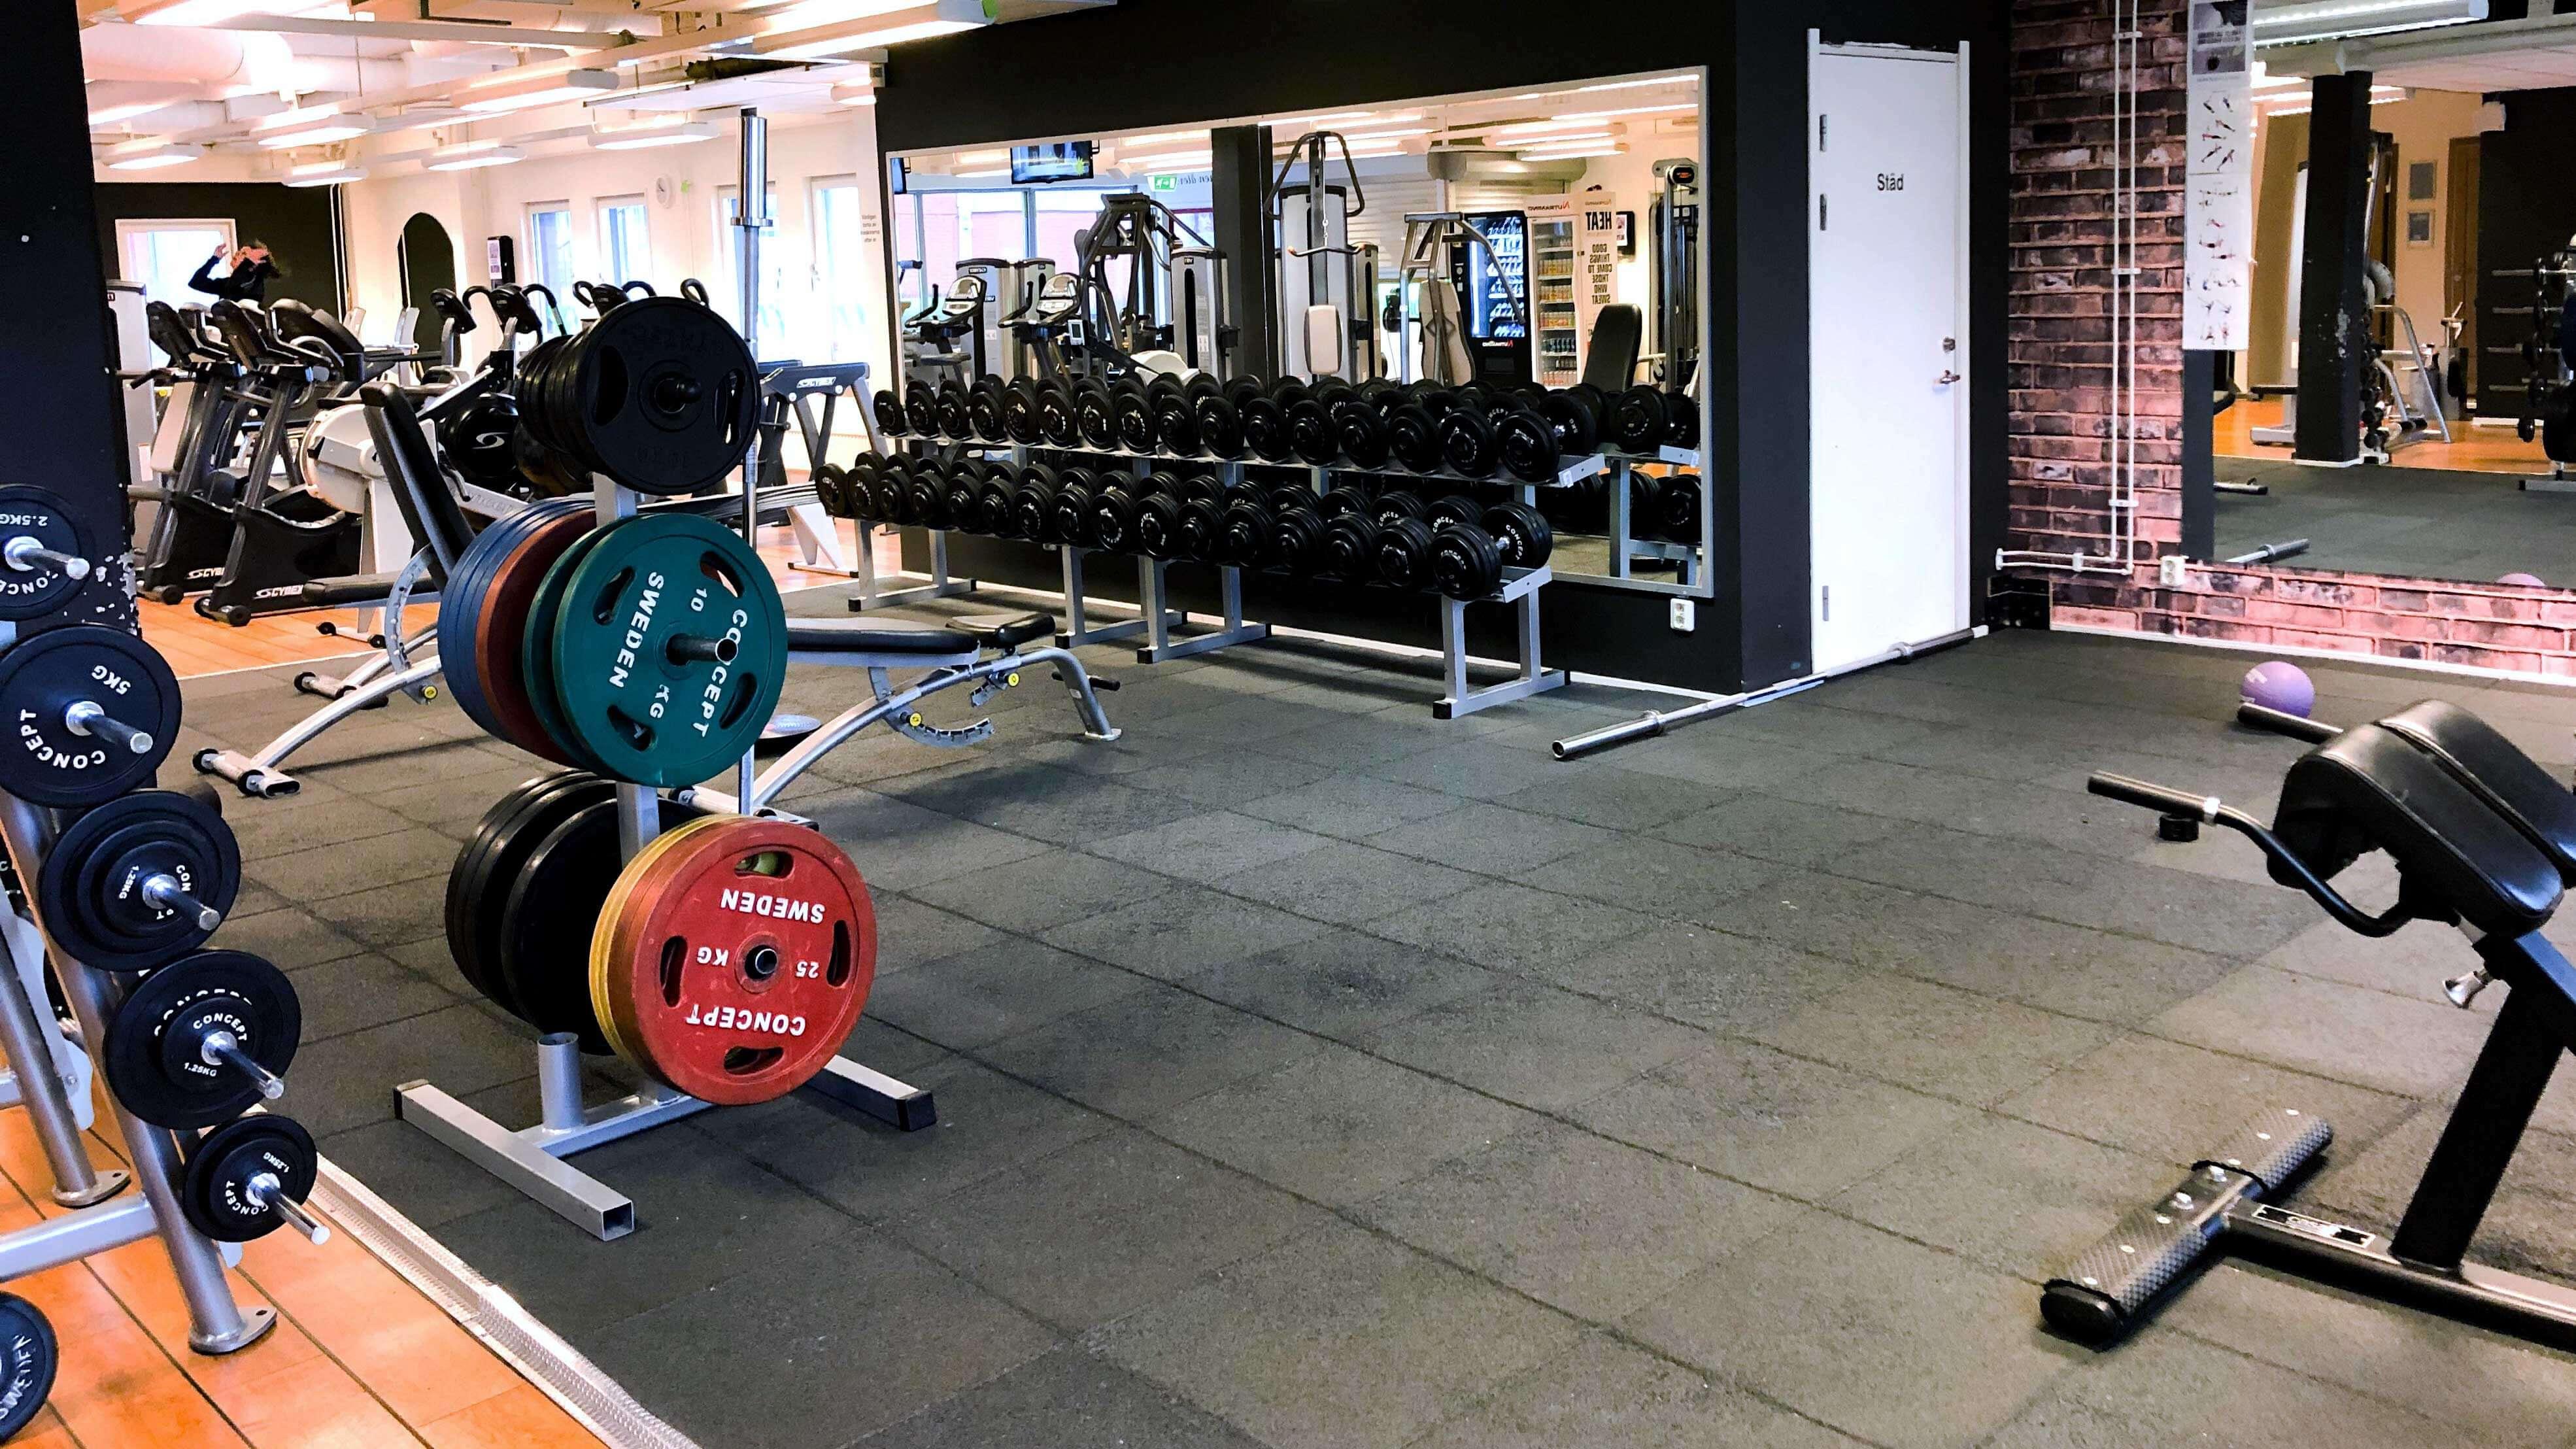 lindome gym och hälsa